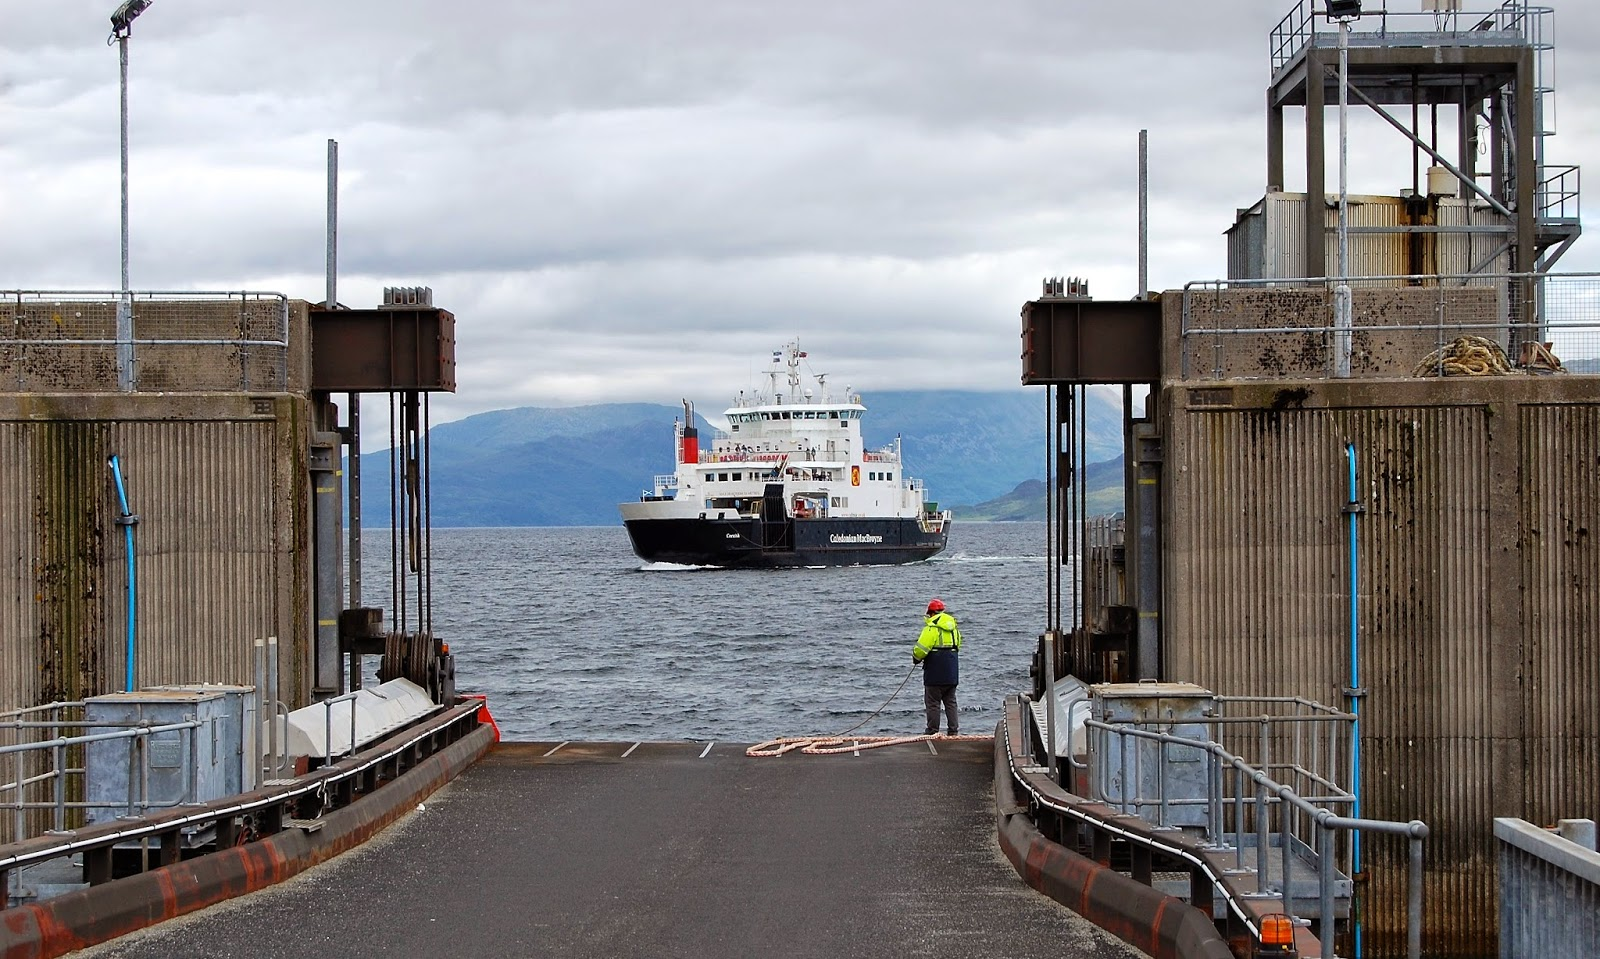 Caledonian MacBrayne ferry boat arrives in Armadale, Isle of Skye